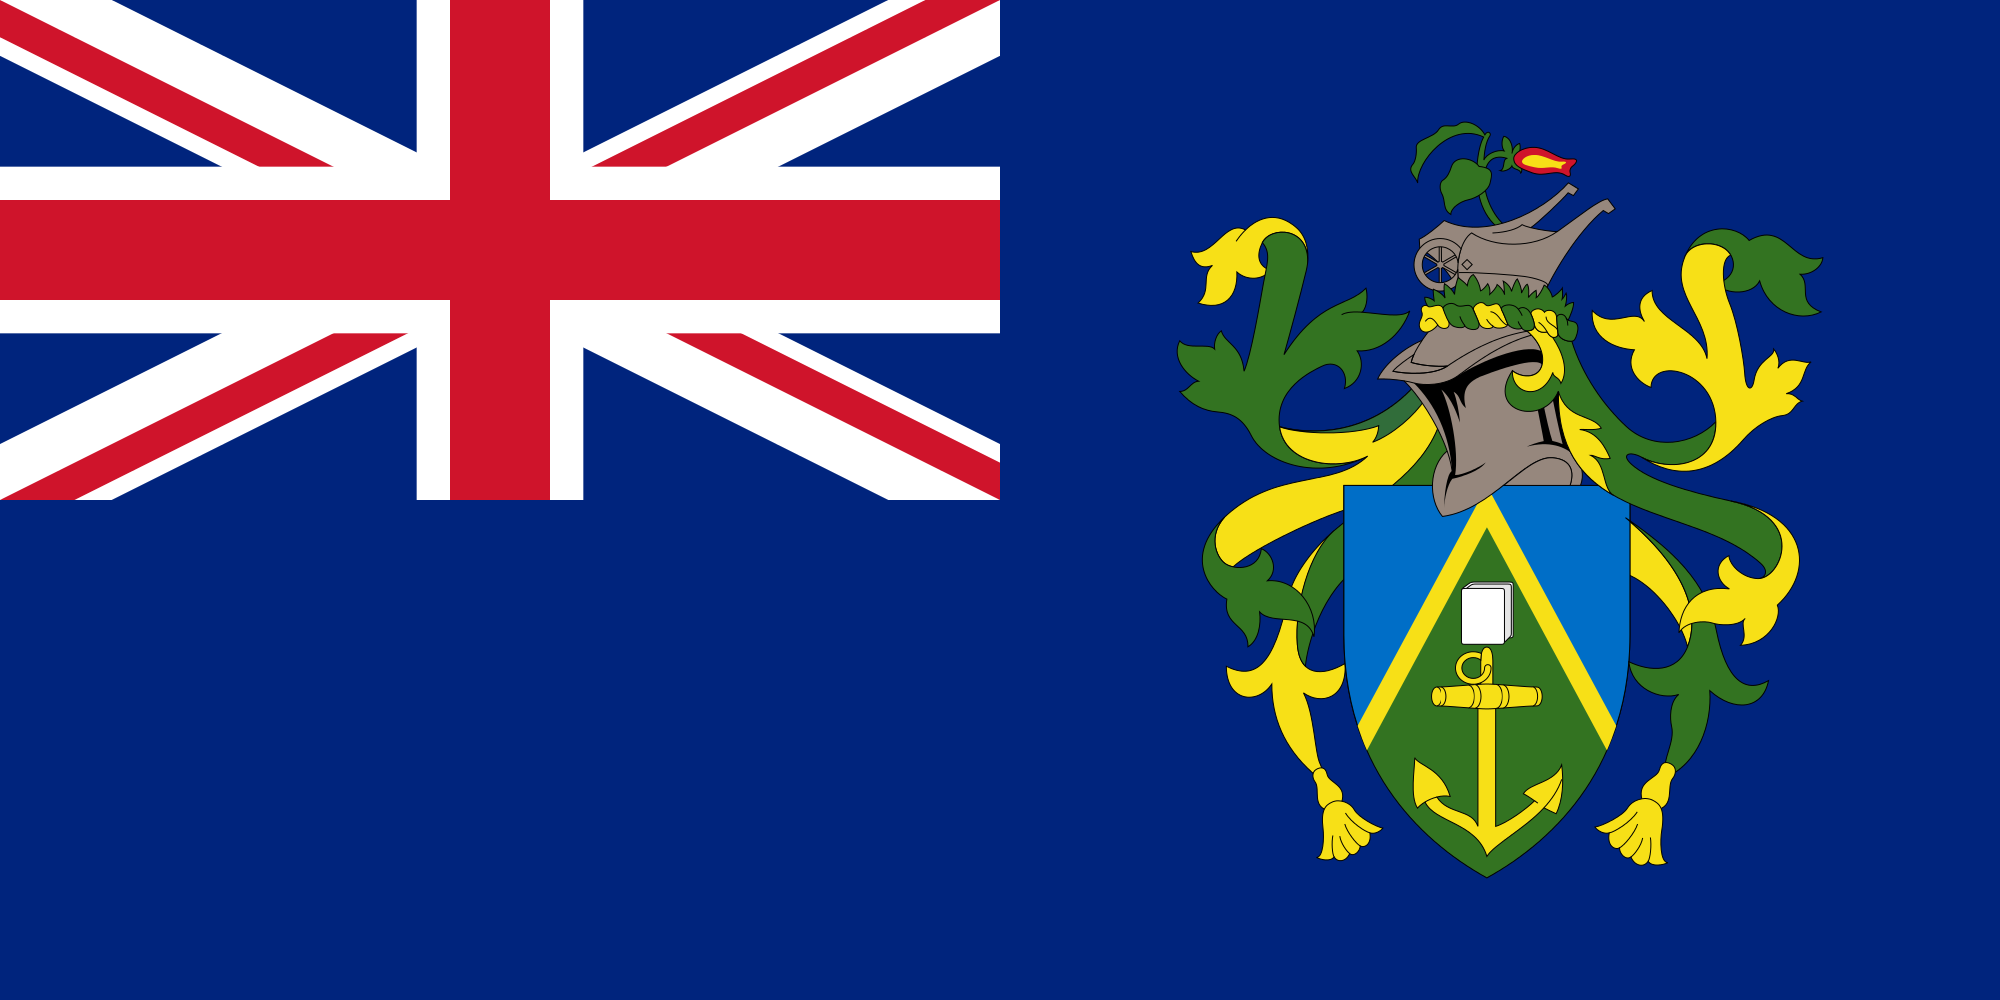 islas pitcairn, pays, emblème, logo, symbole - Fonds d'écran HD - Professor-falken.com